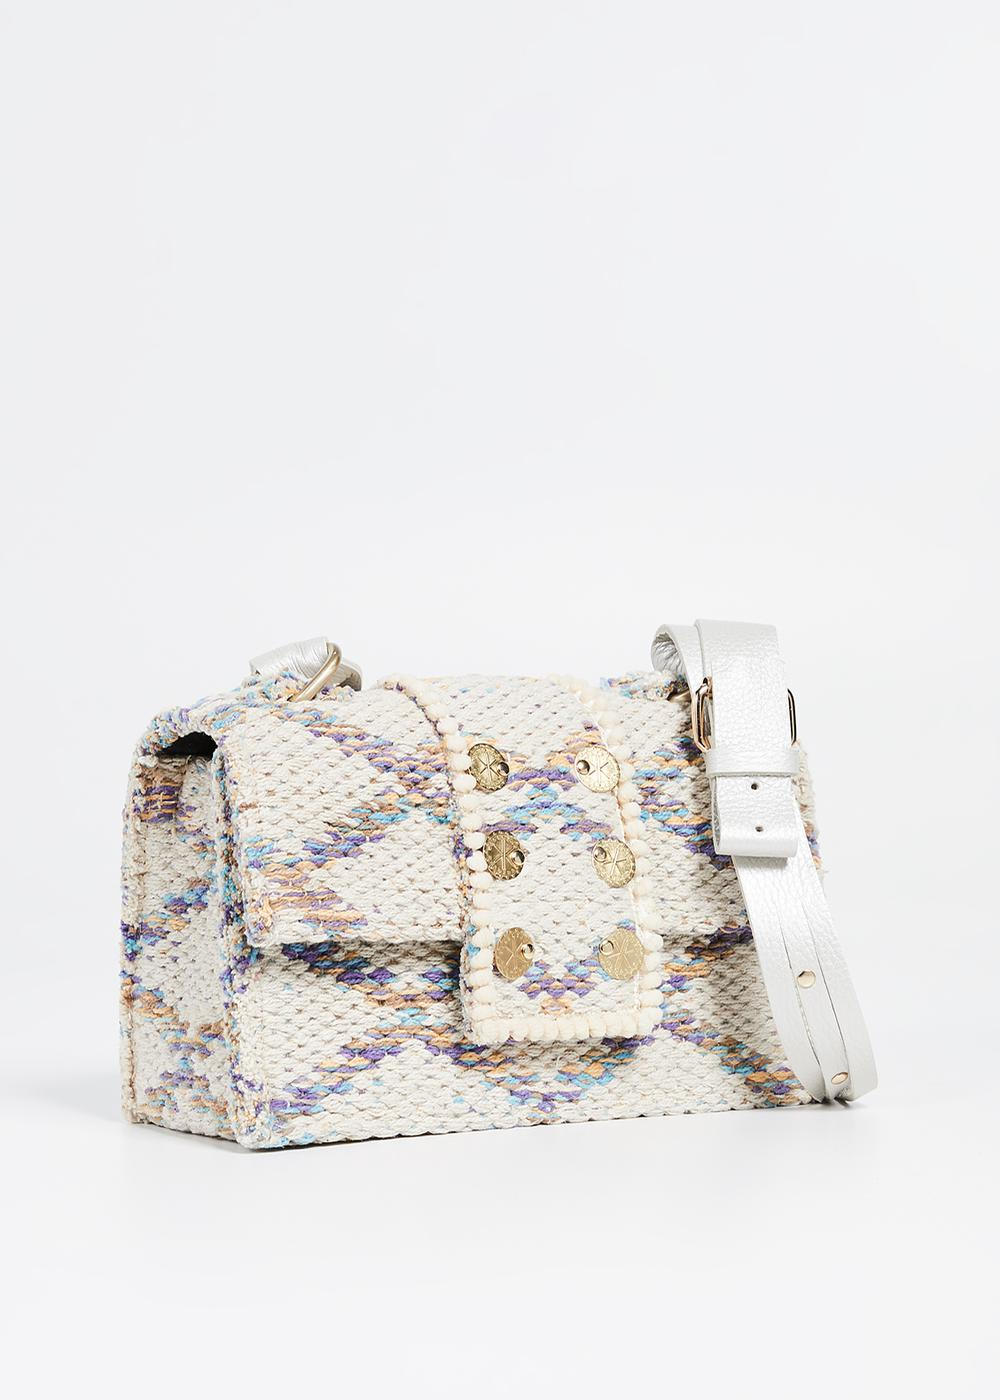 Shopbop product